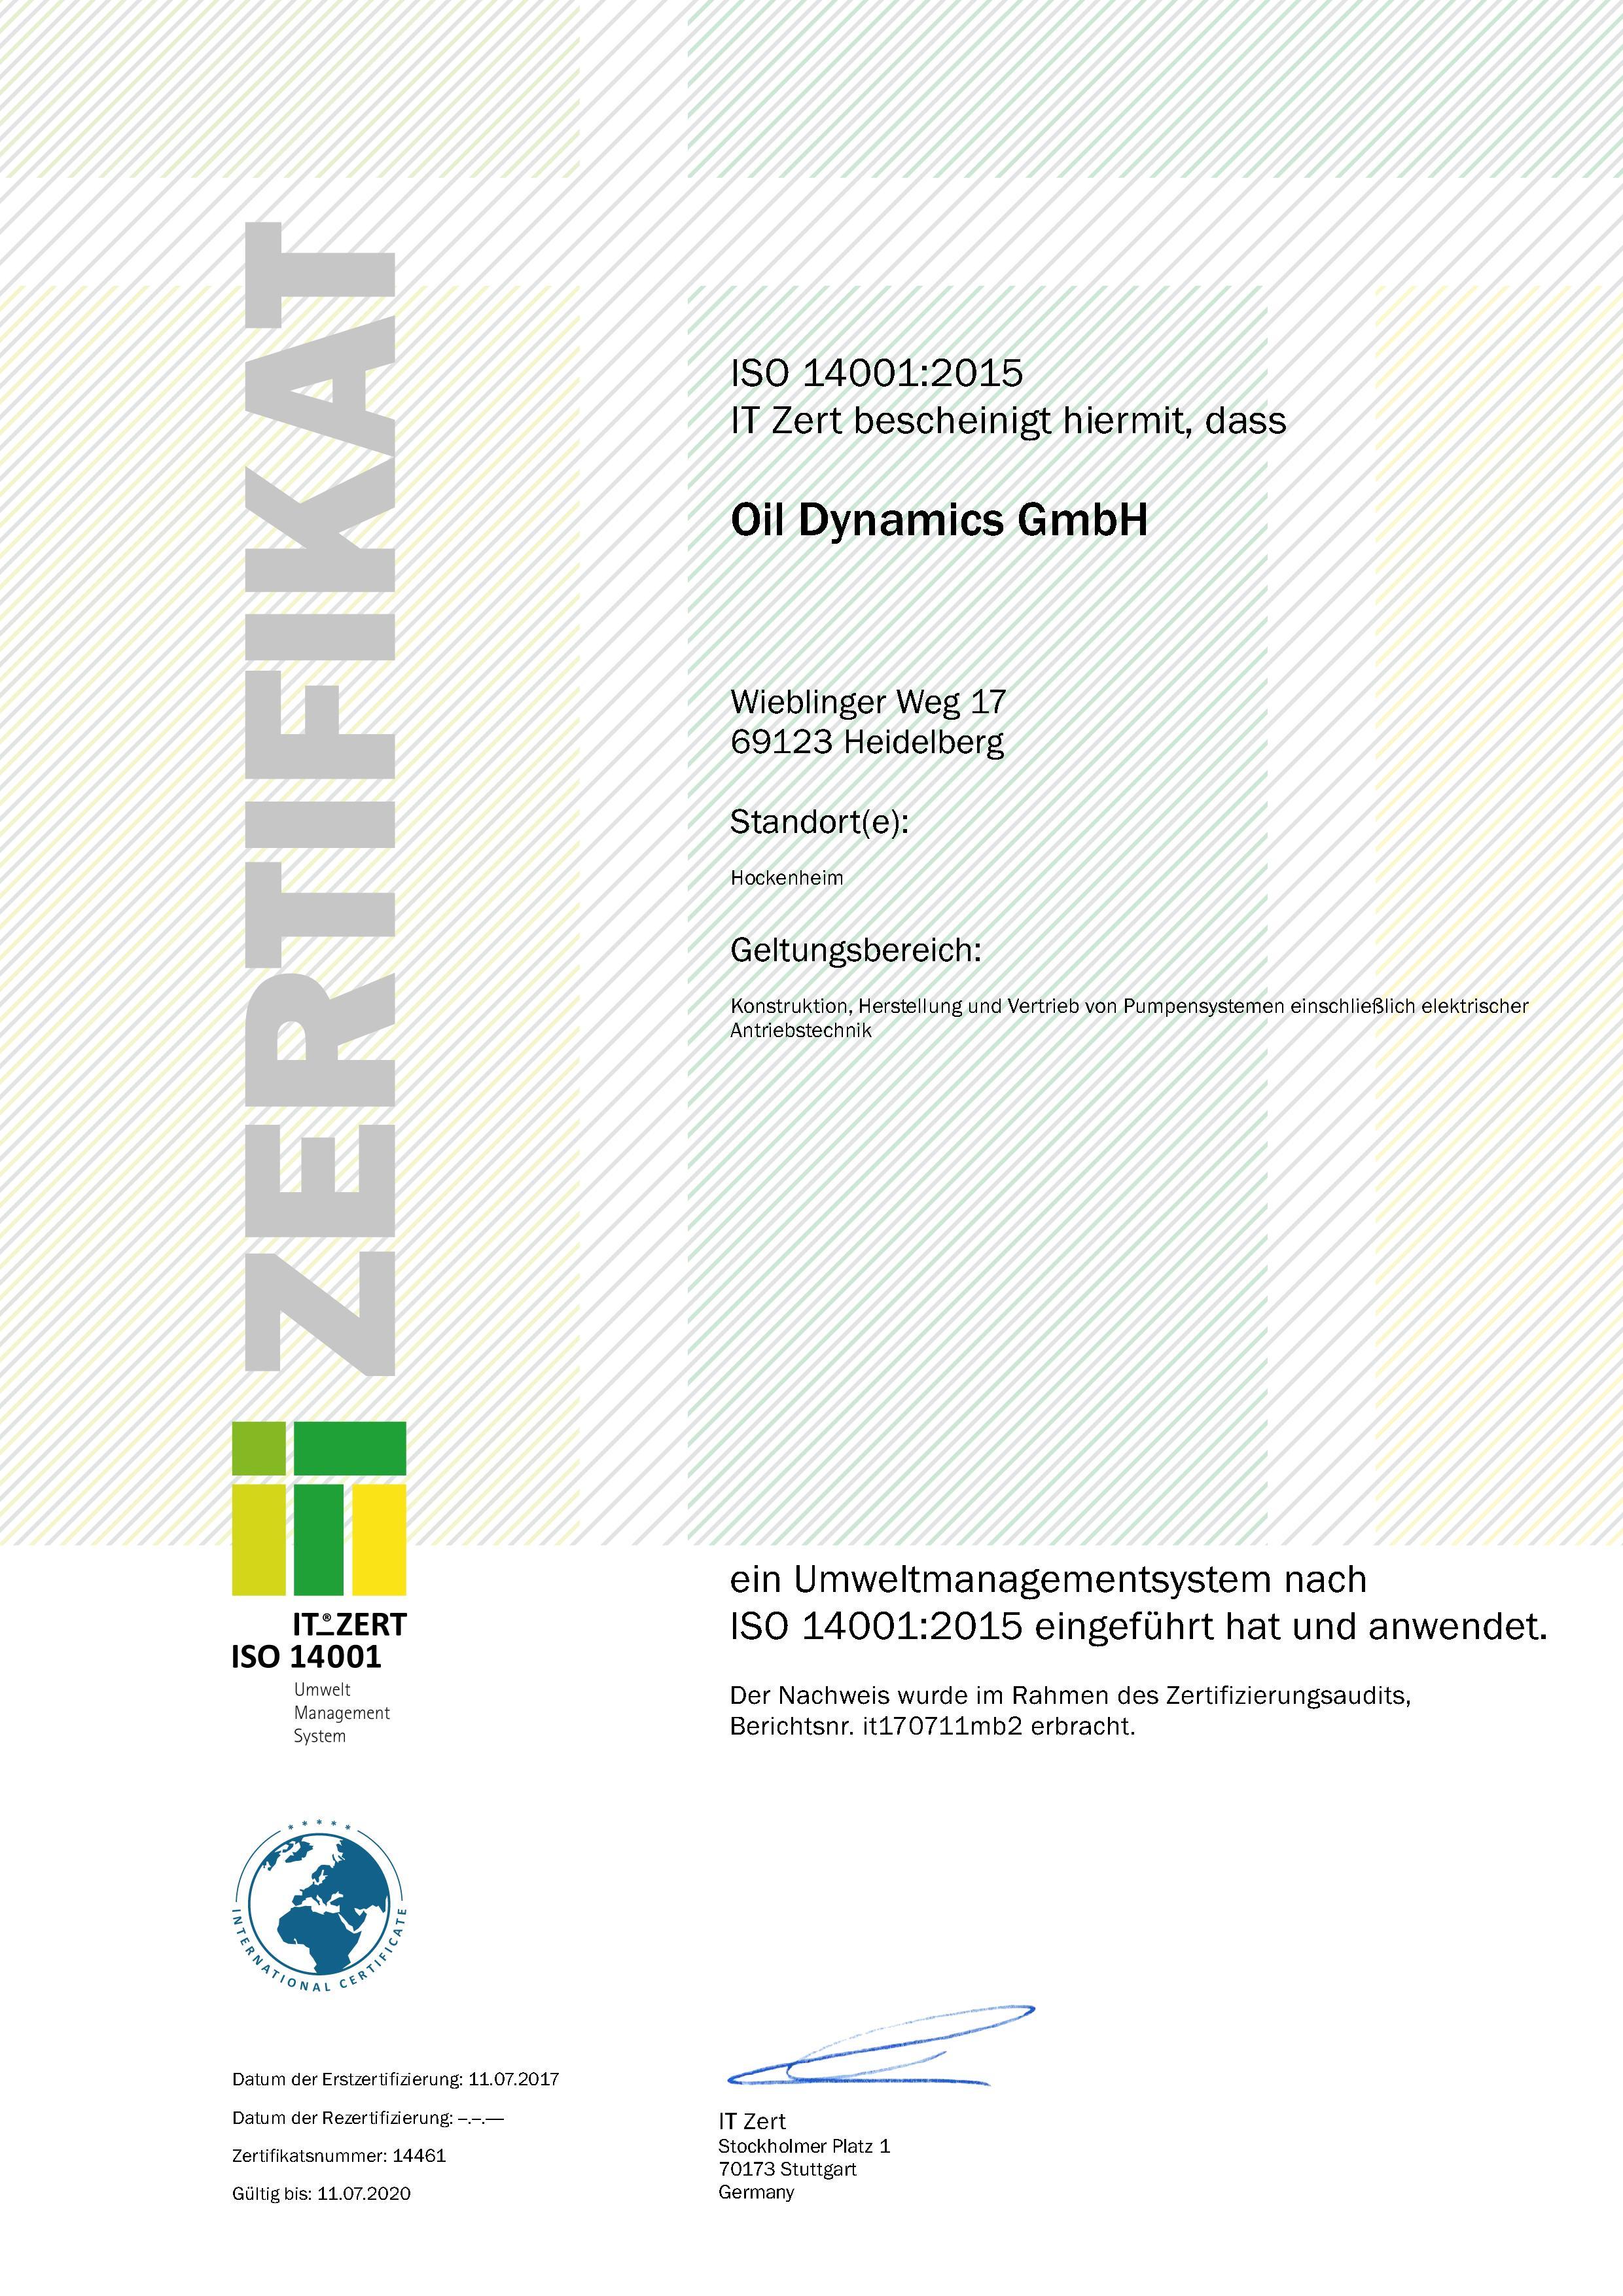 ZERT_ISO14001-2015_Oil Dynamics GmbH_de